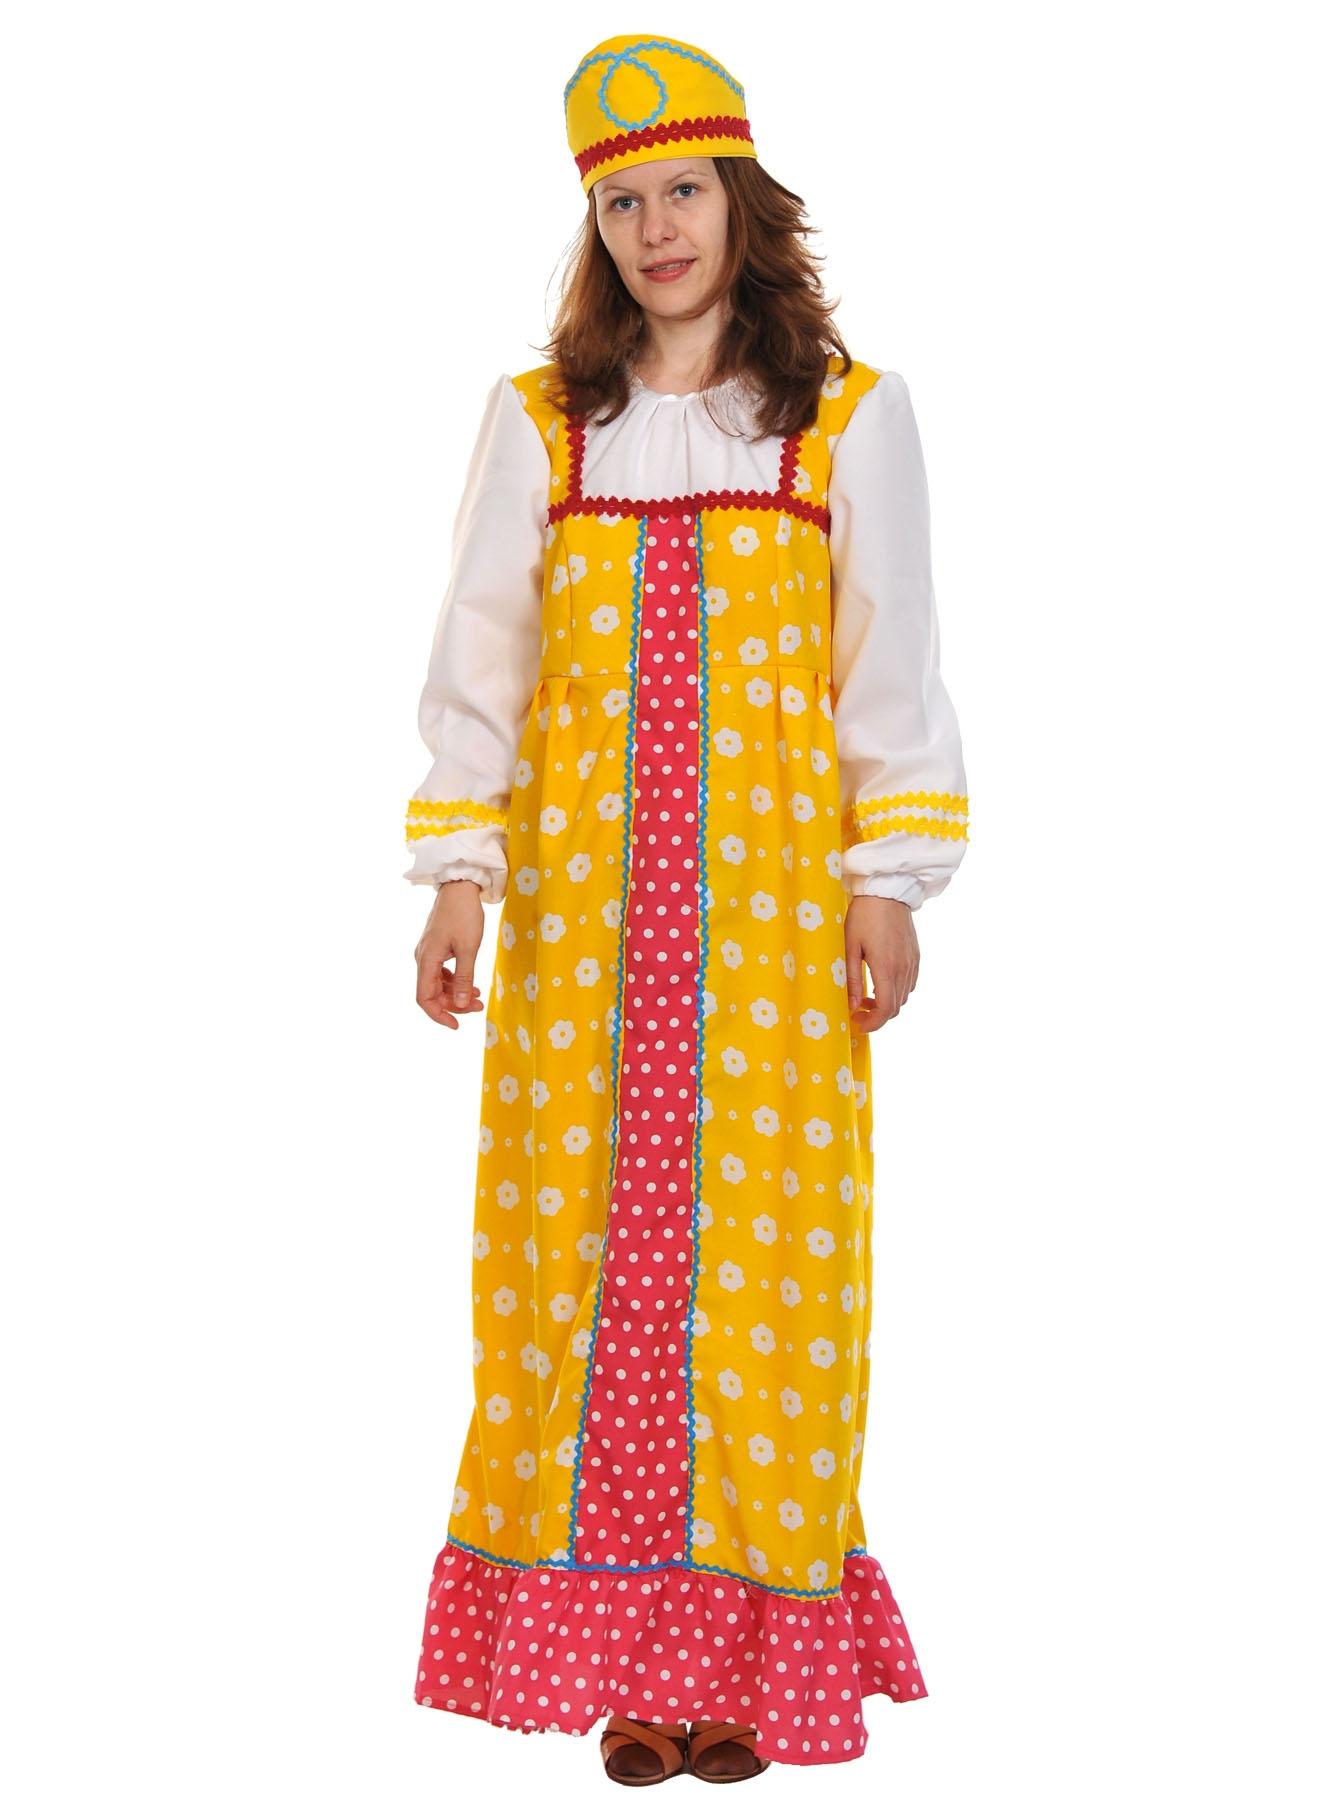 Желтый костюм Аленушки для взрослых (M)